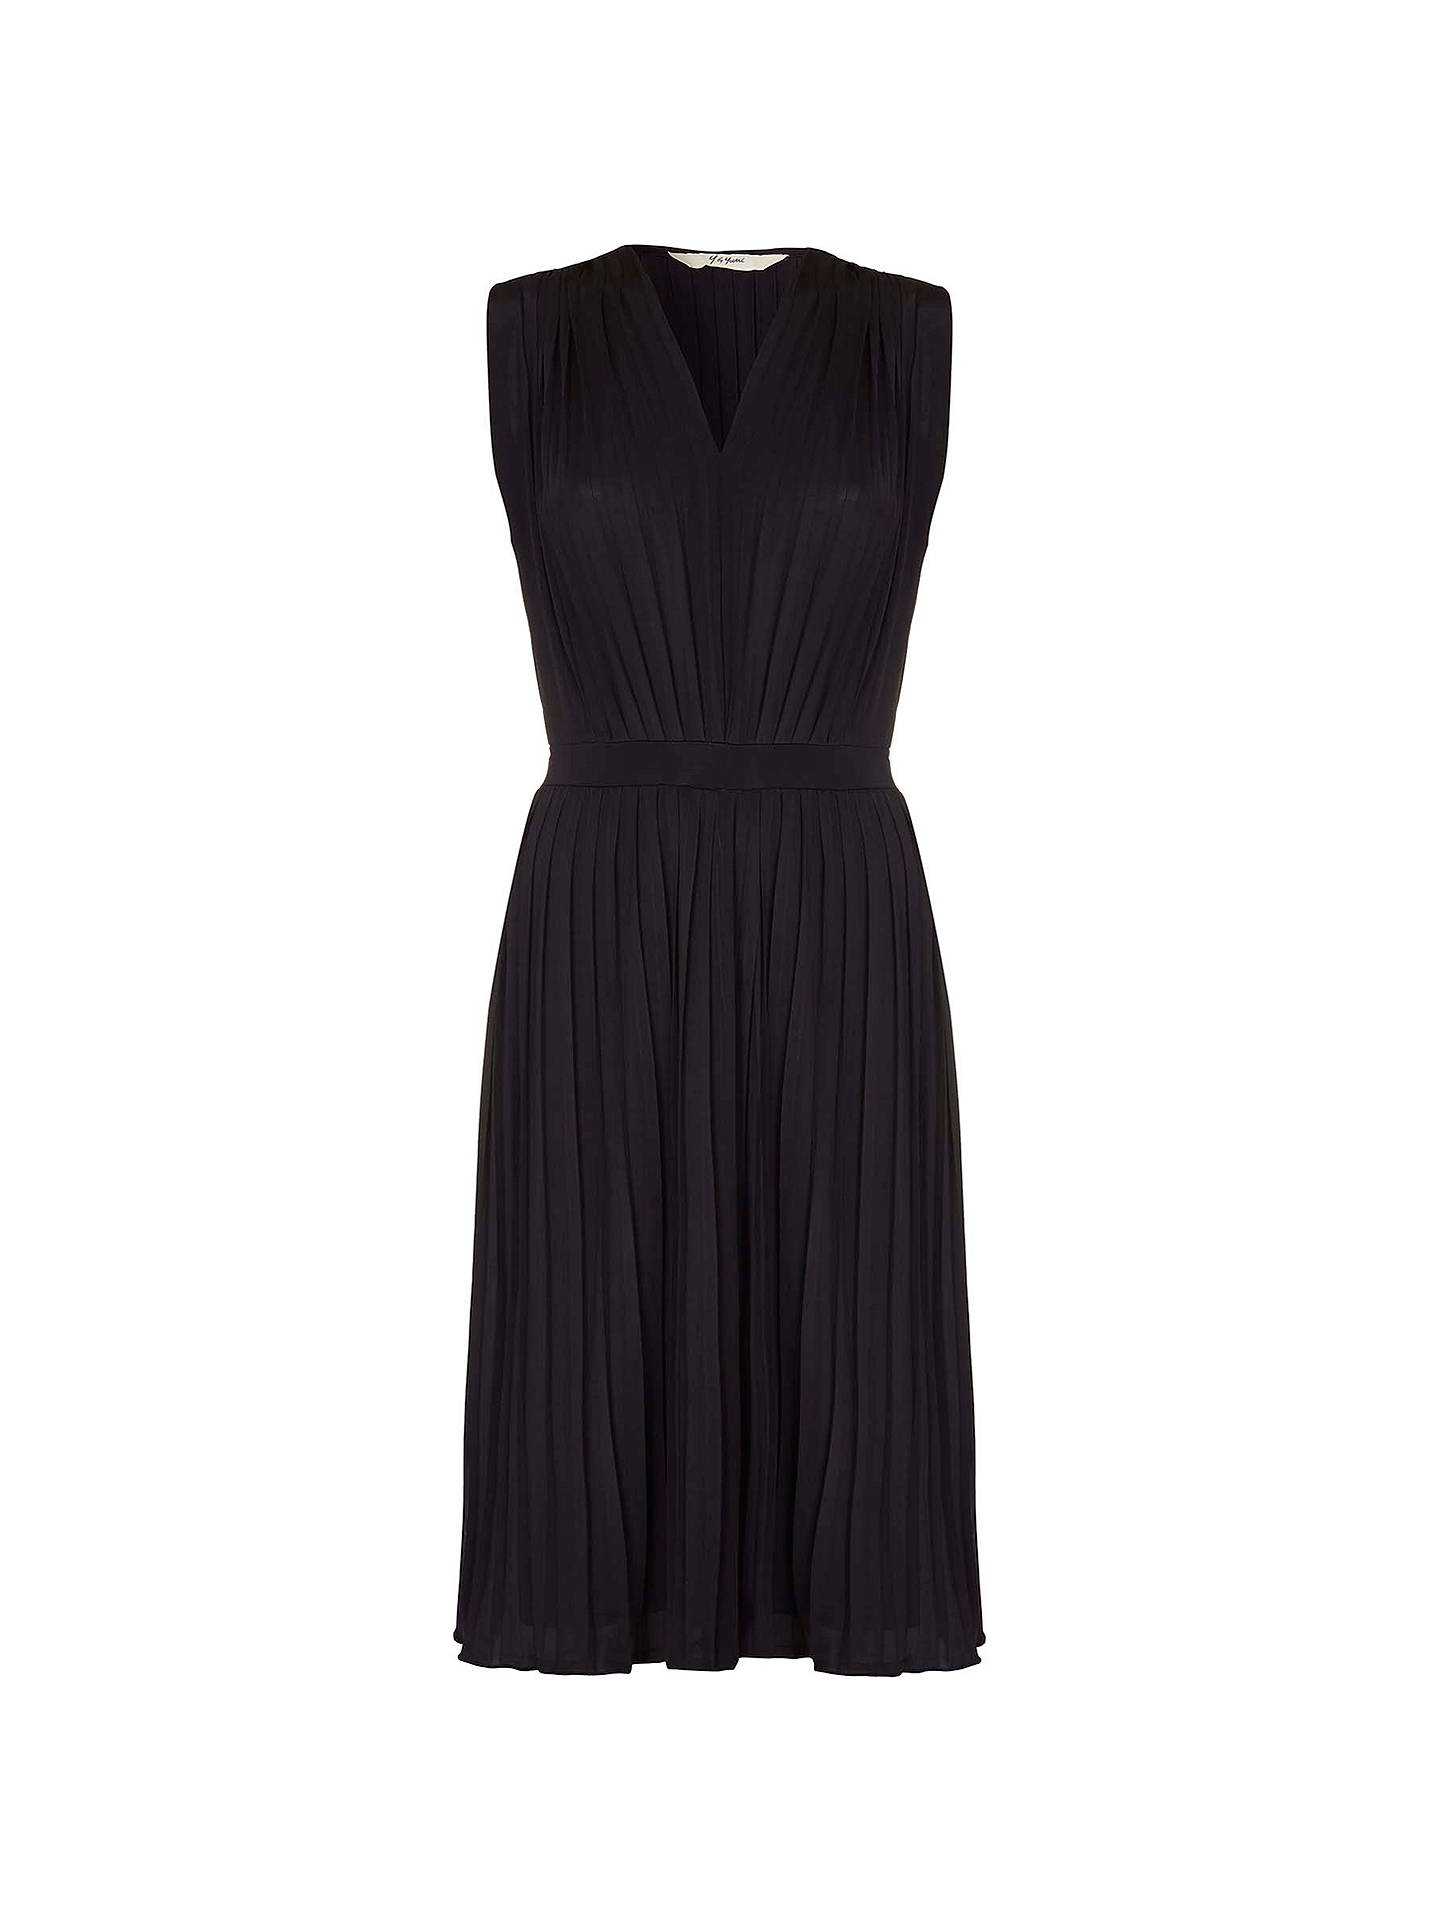 9510c474331 ... Buy Yumi Pleated Midi Jersey Dress, Black, 8 Online at johnlewis.com ...